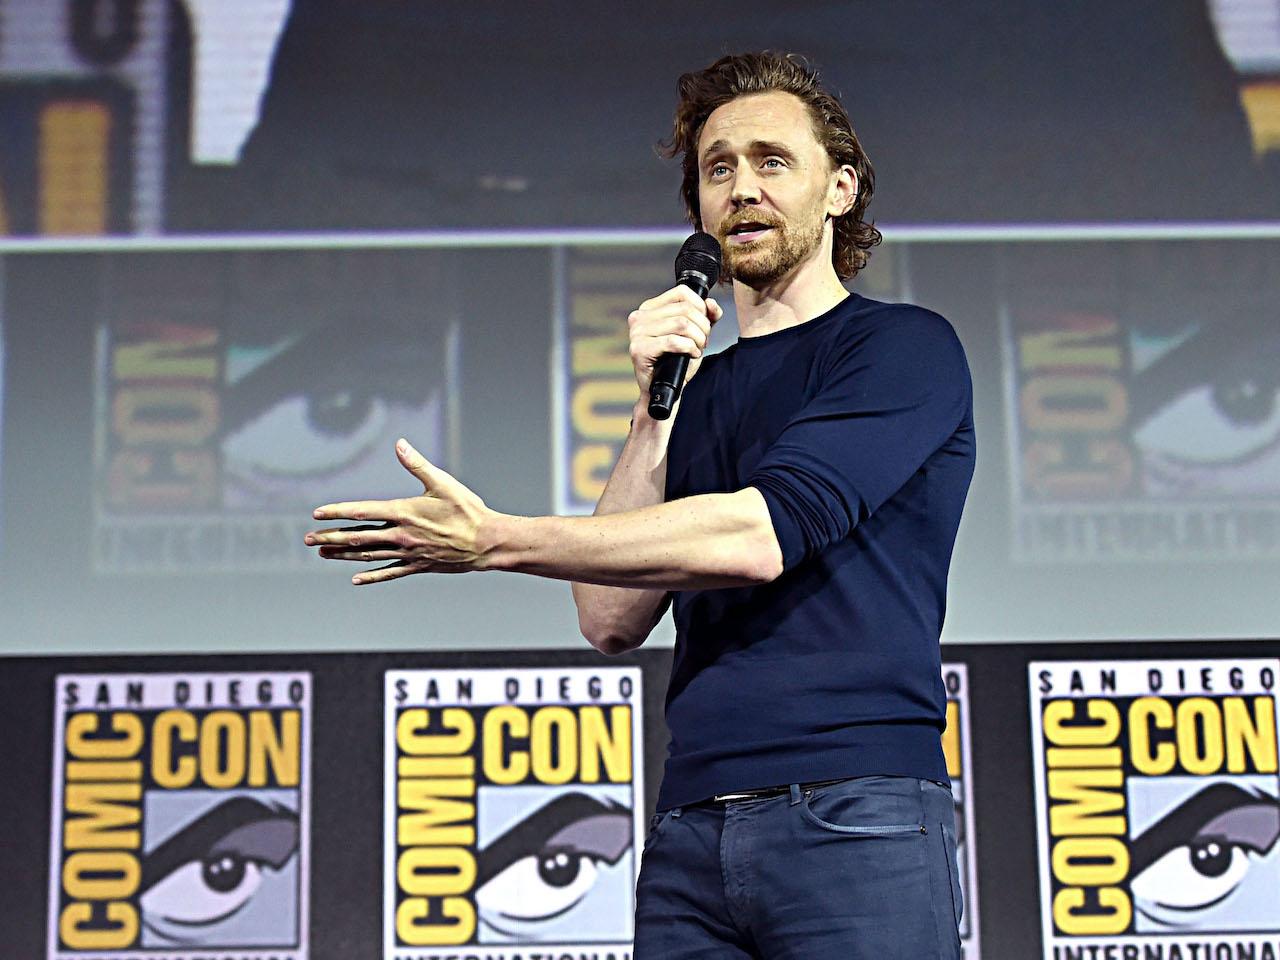 Tom Hiddleston of Marvel Studios' 'Loki' at the San Diego Comic-Con International 2019 Marvel Studios Panel in Hall H